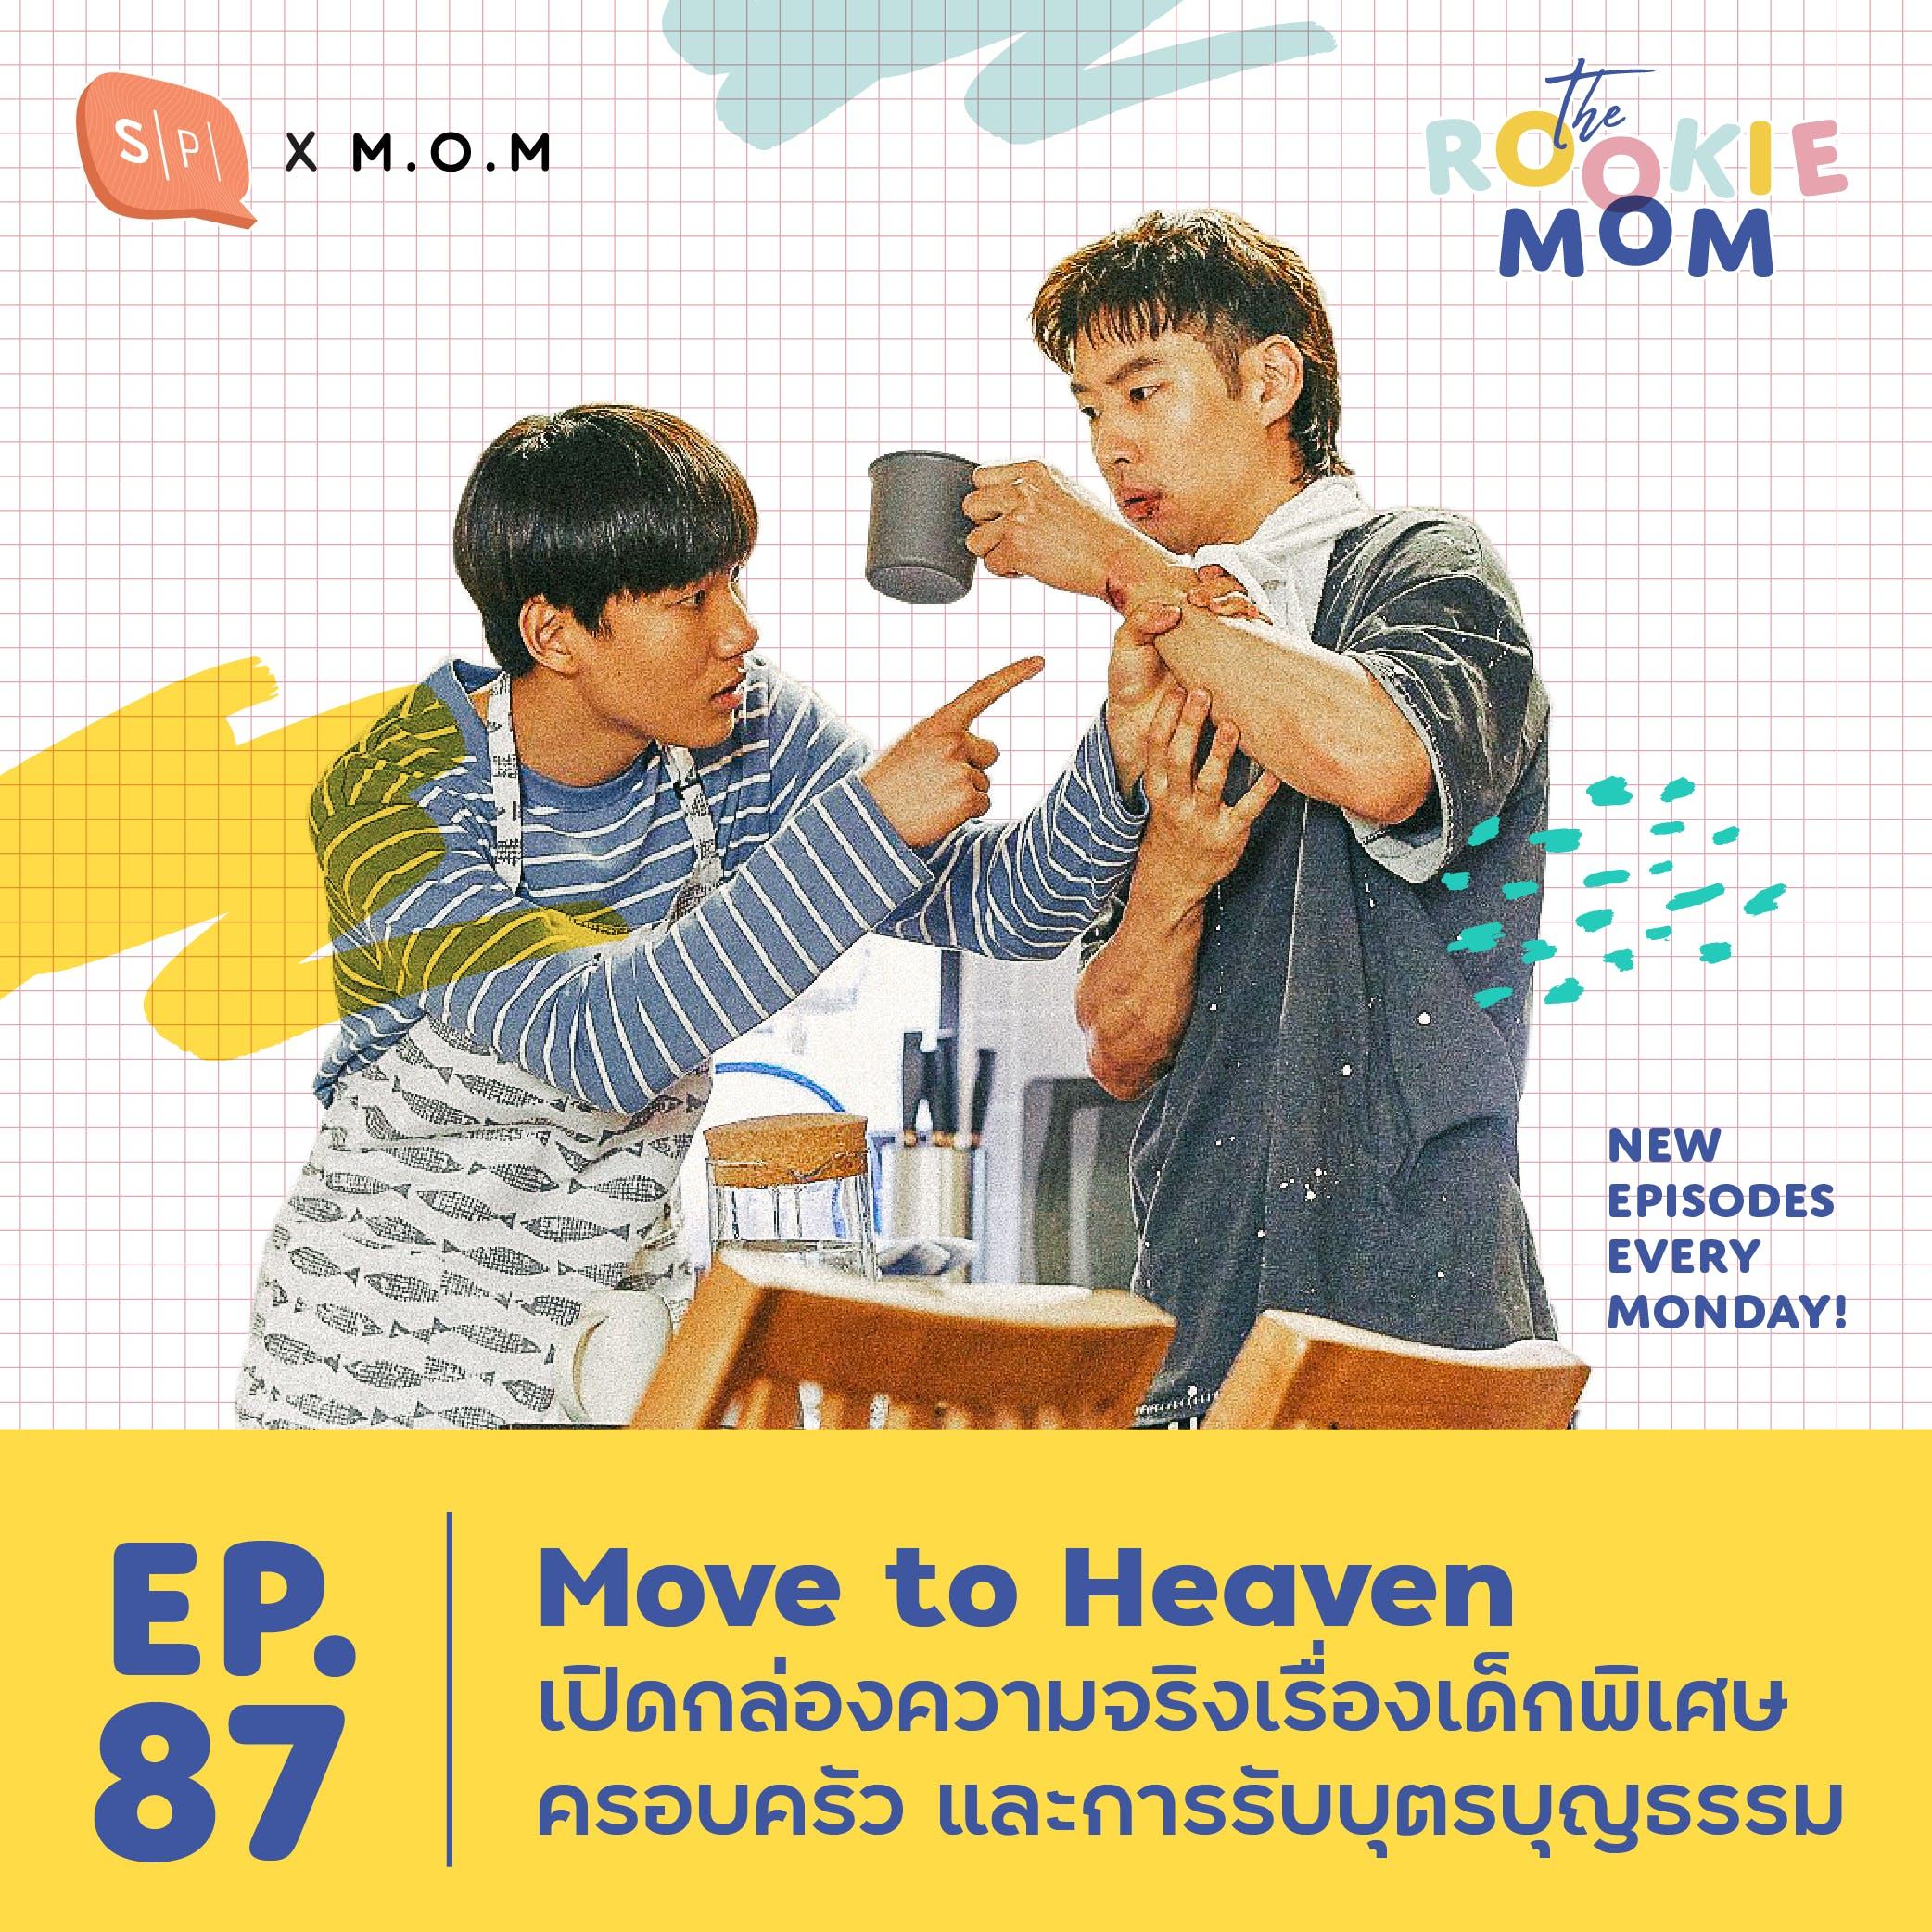 Move to Heaven เปิดกล่องความจริงเรื่องเด็กพิเศษ ครอบครัว และการรับบุตรบุญธรรม | The Rookie Mom EP87